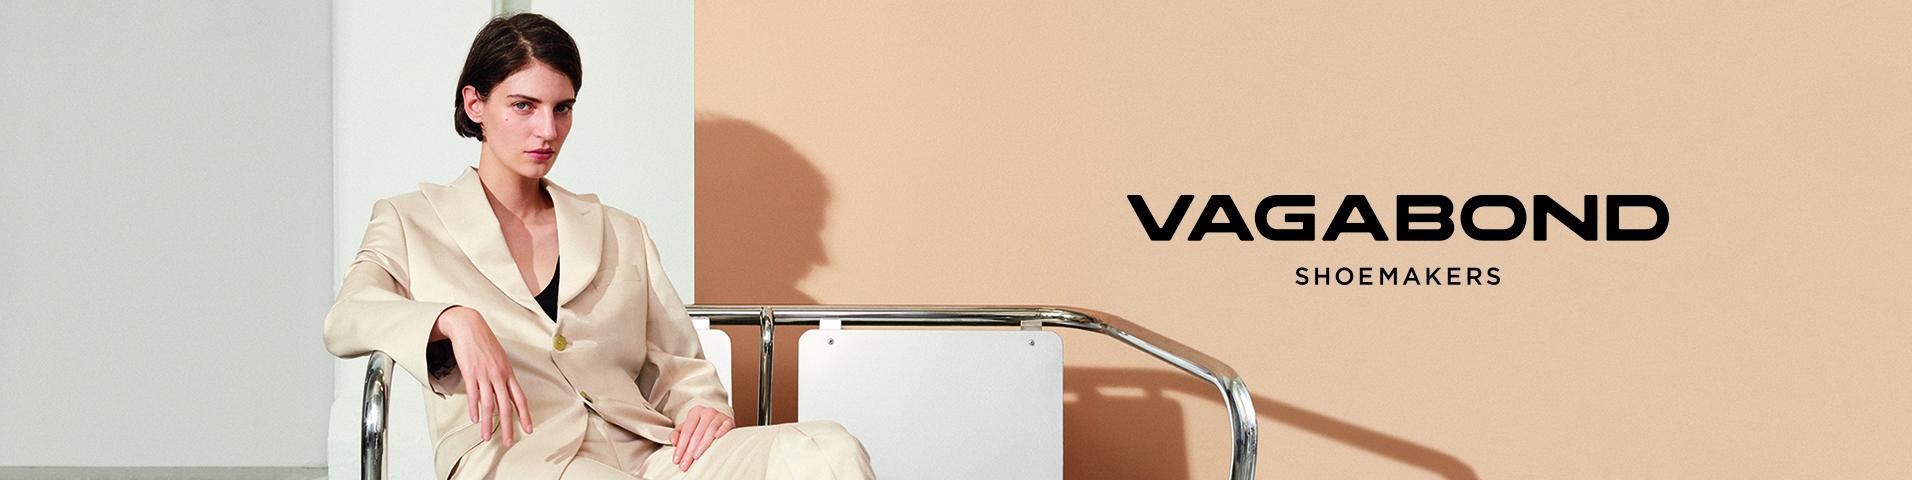 Produktkatalog von Vagabond · SchuheAccessoiresSale 1bc6f011e4